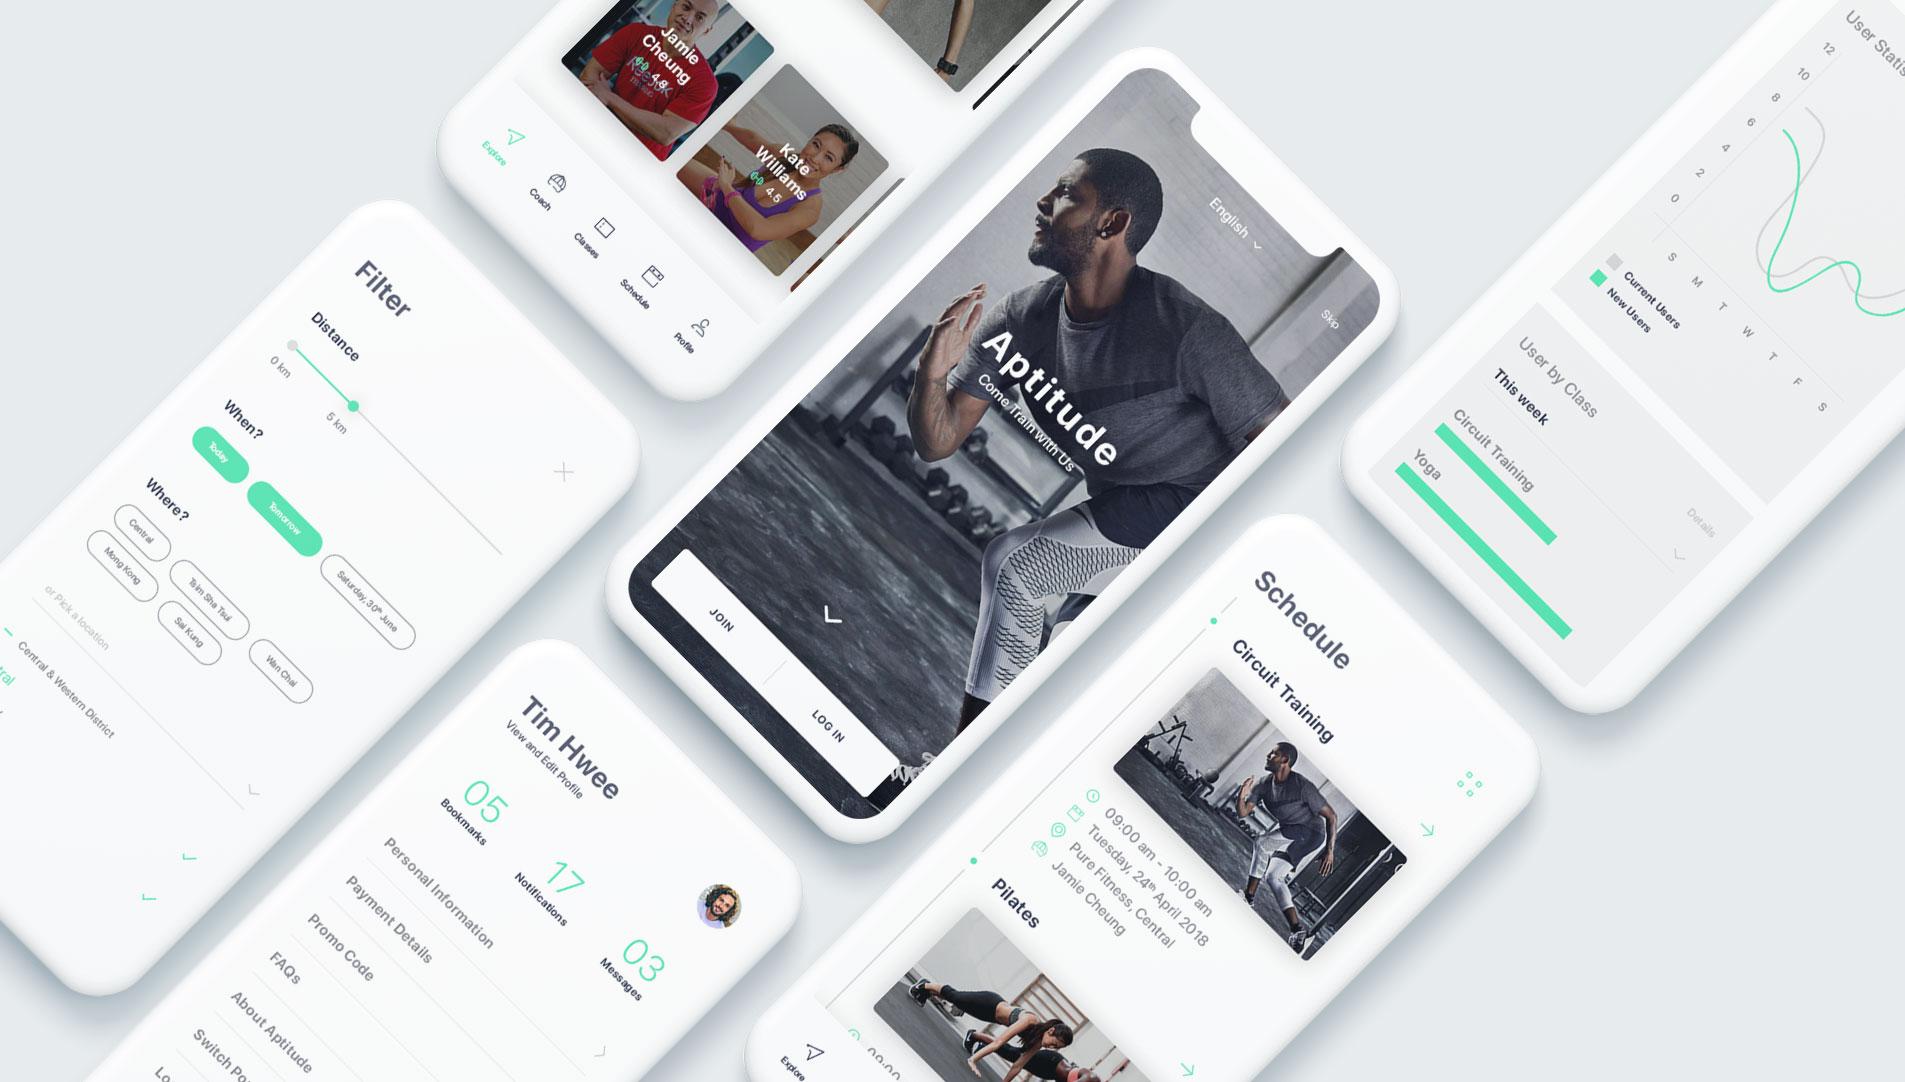 app development hong kong aptitude slideshow 00